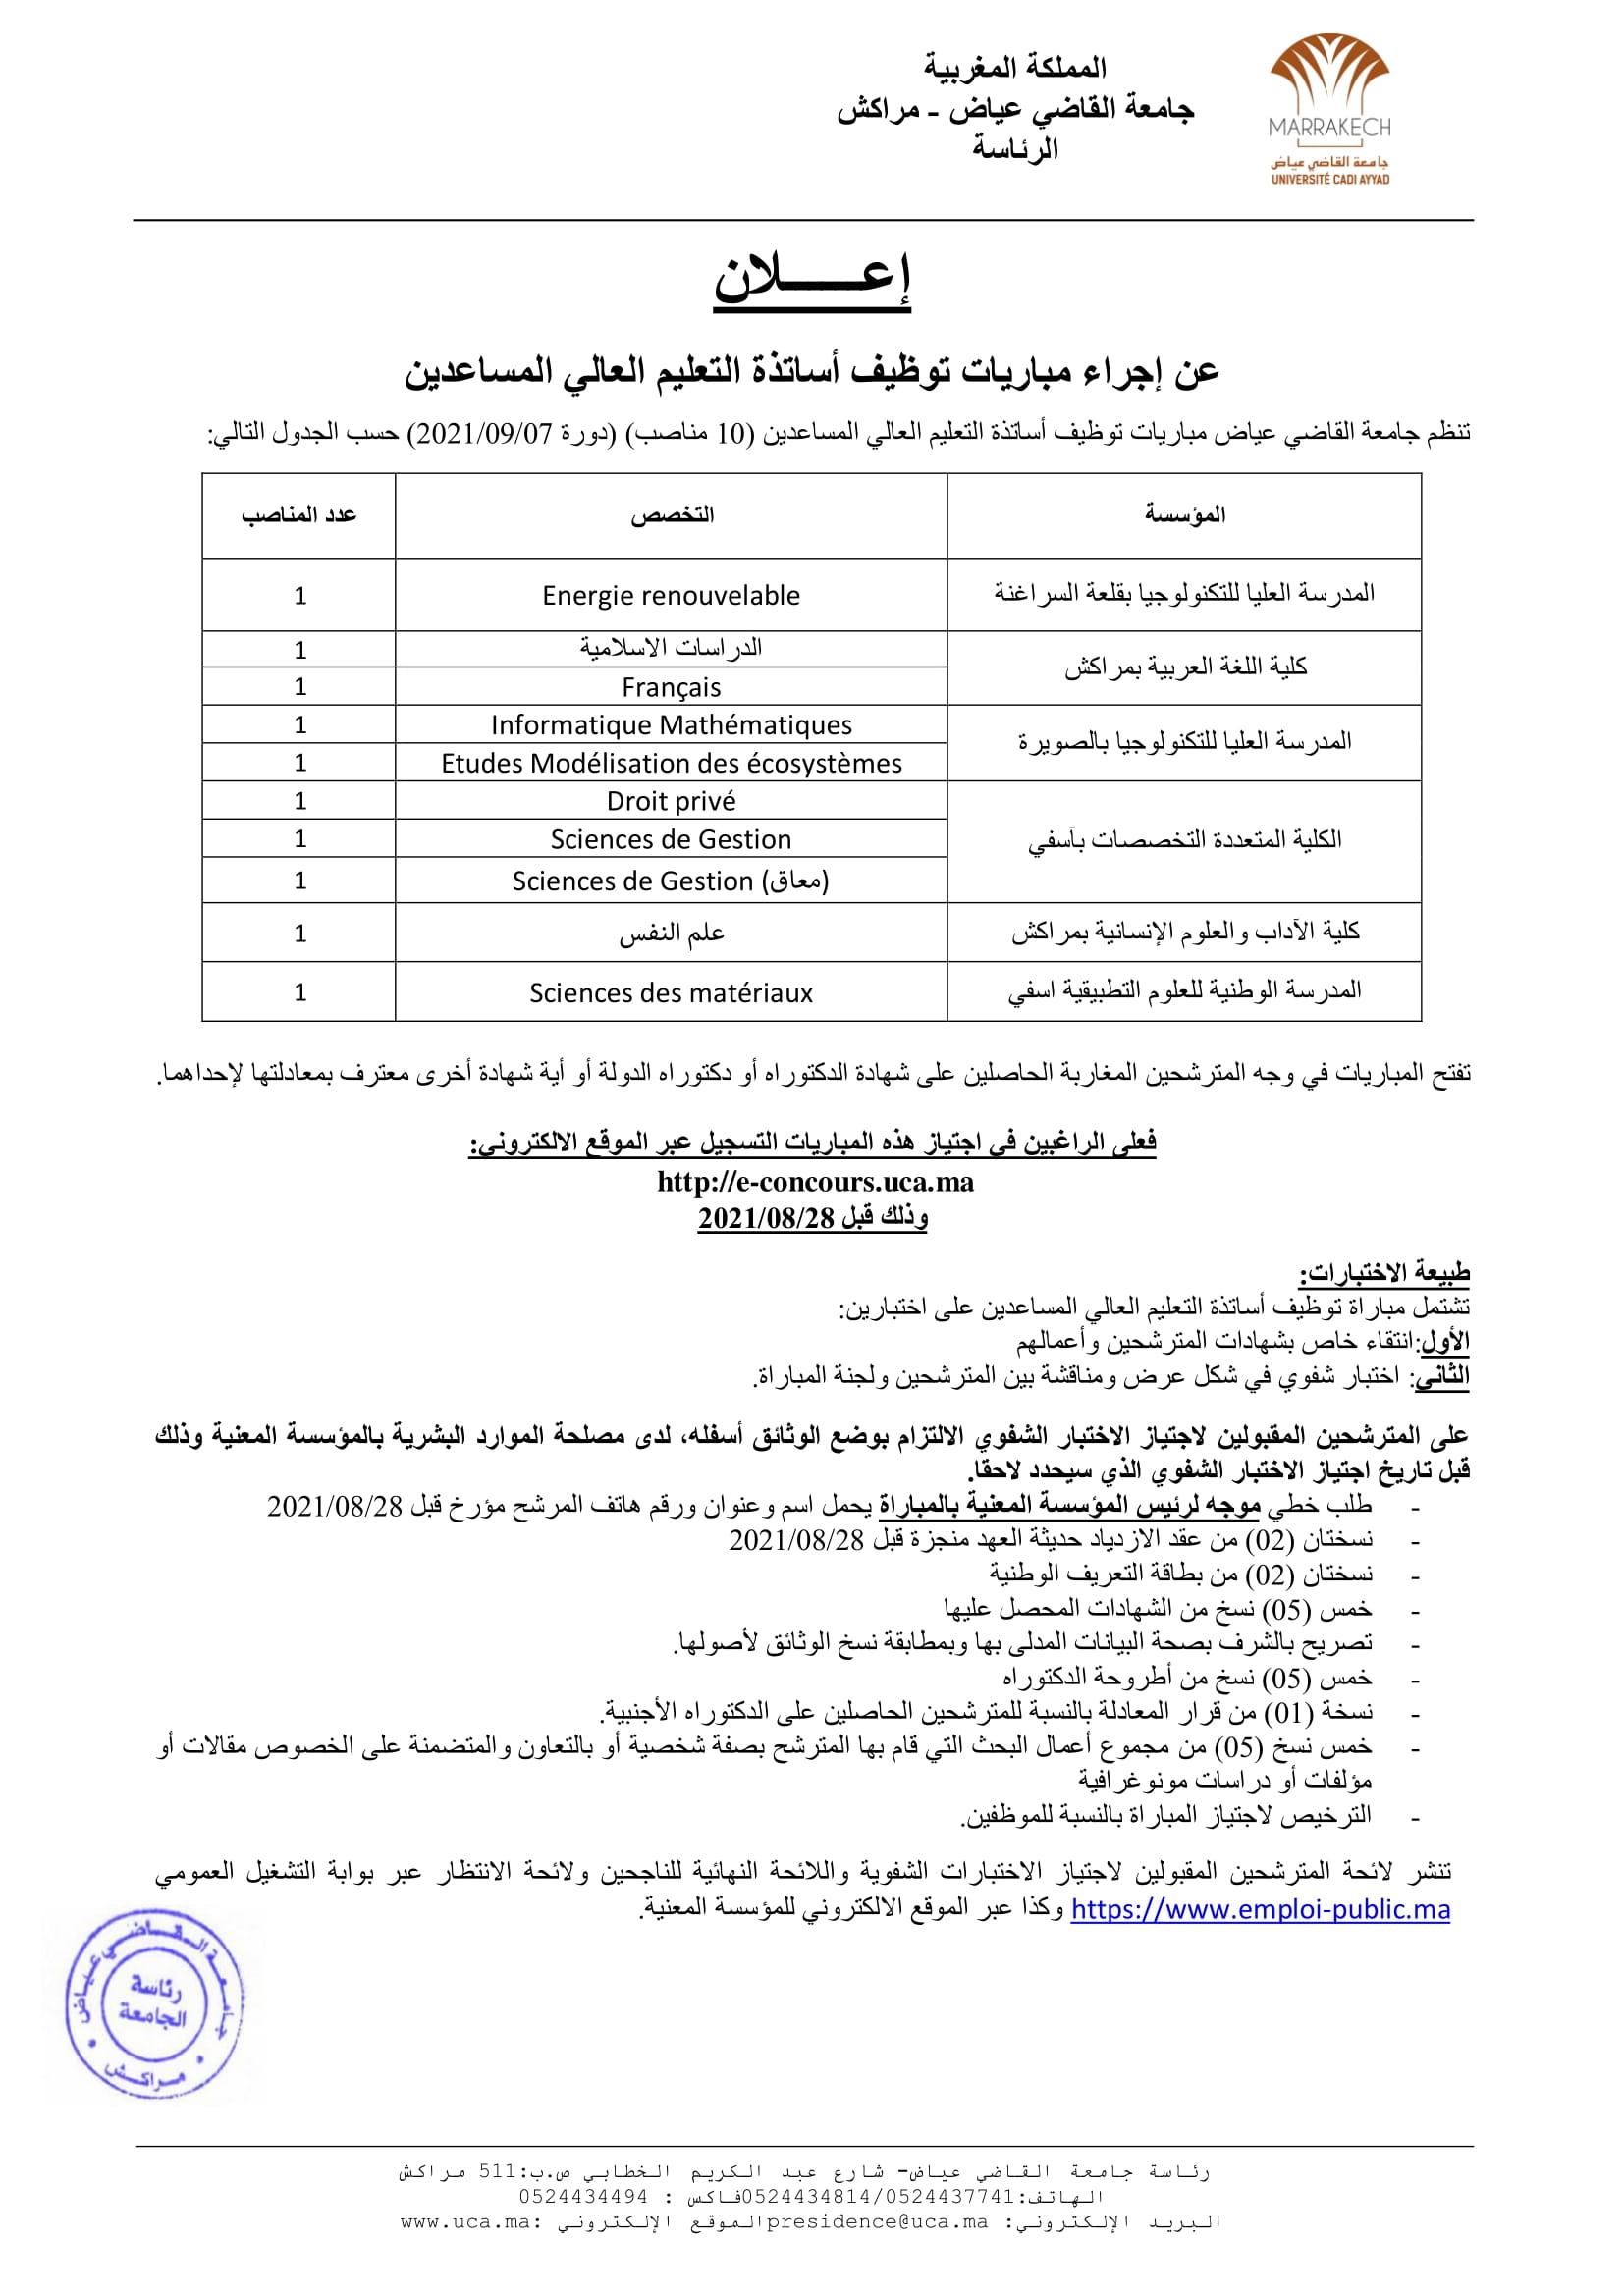 FRAIS 1 Concours Université Cadi Ayyad 2021 (19 Postes)